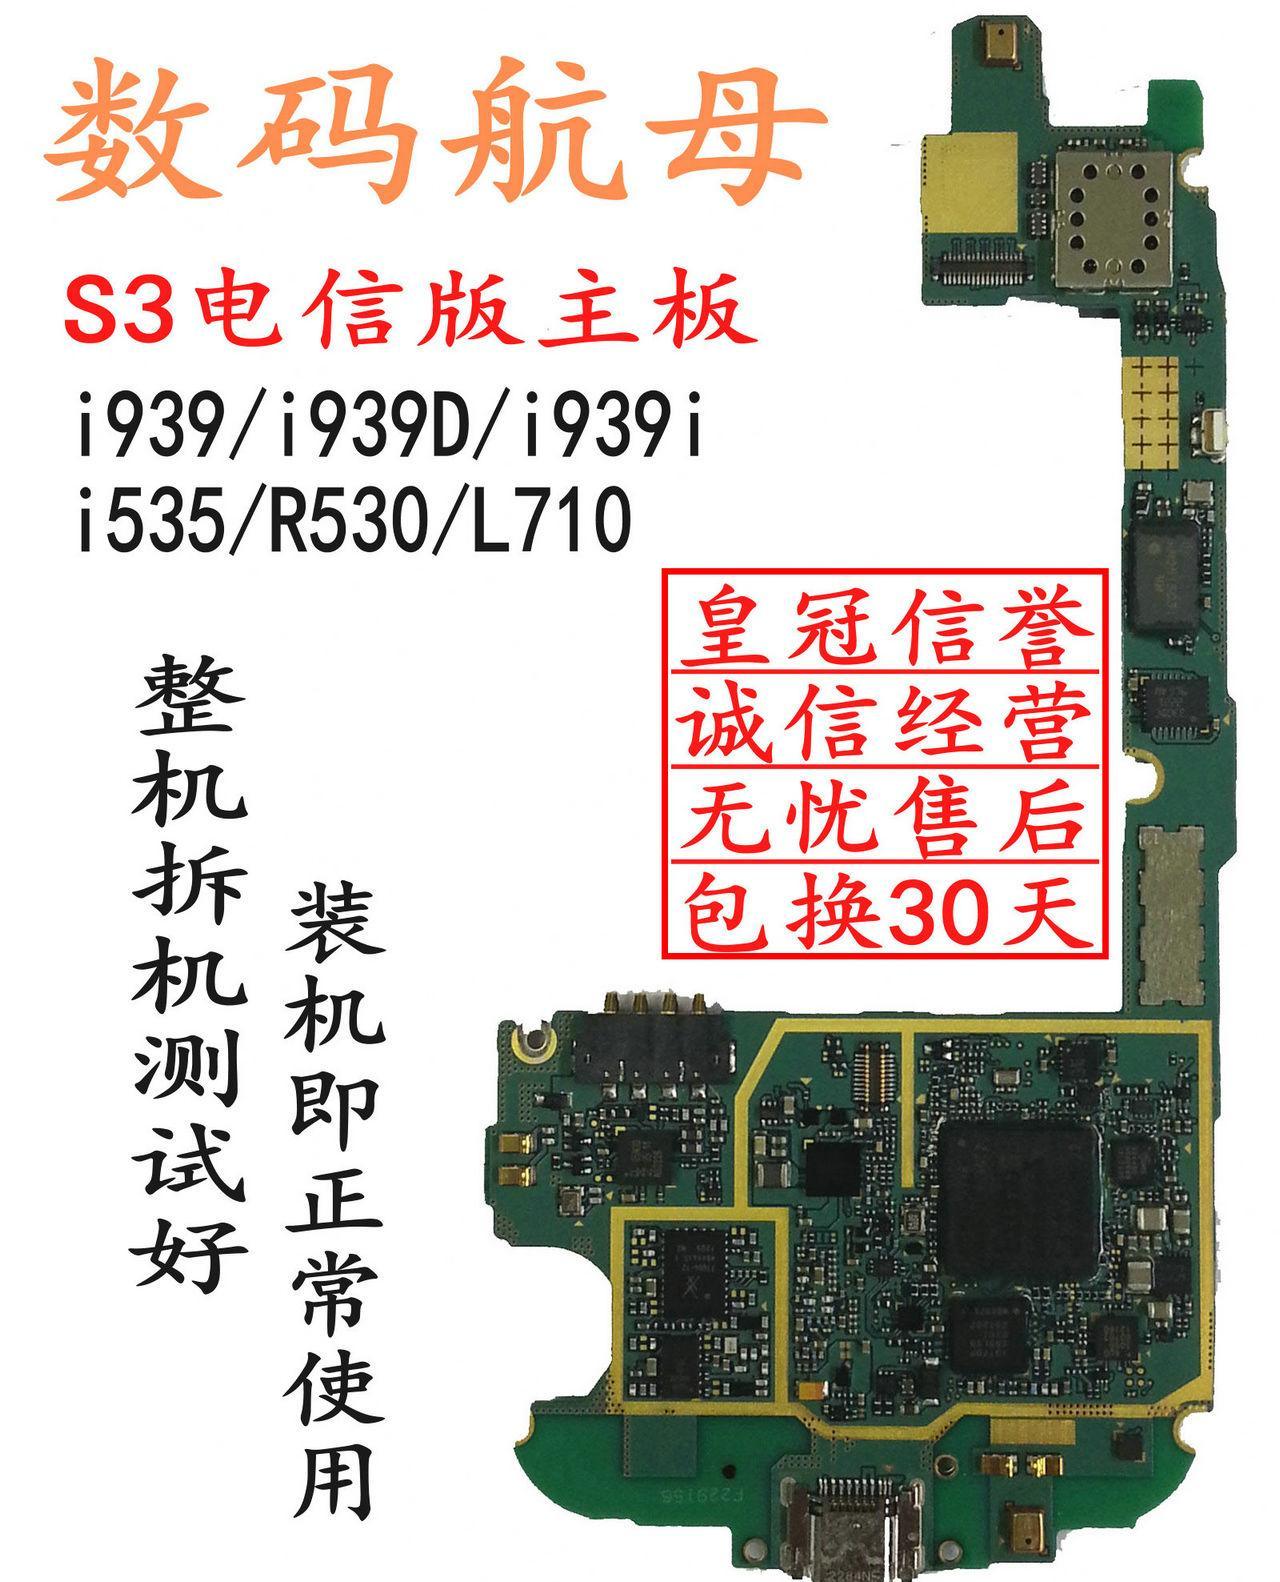 Samsung Motherboard S3/T999/I747i9305i535/L710/L720t/R530u/I939d/Sc03e